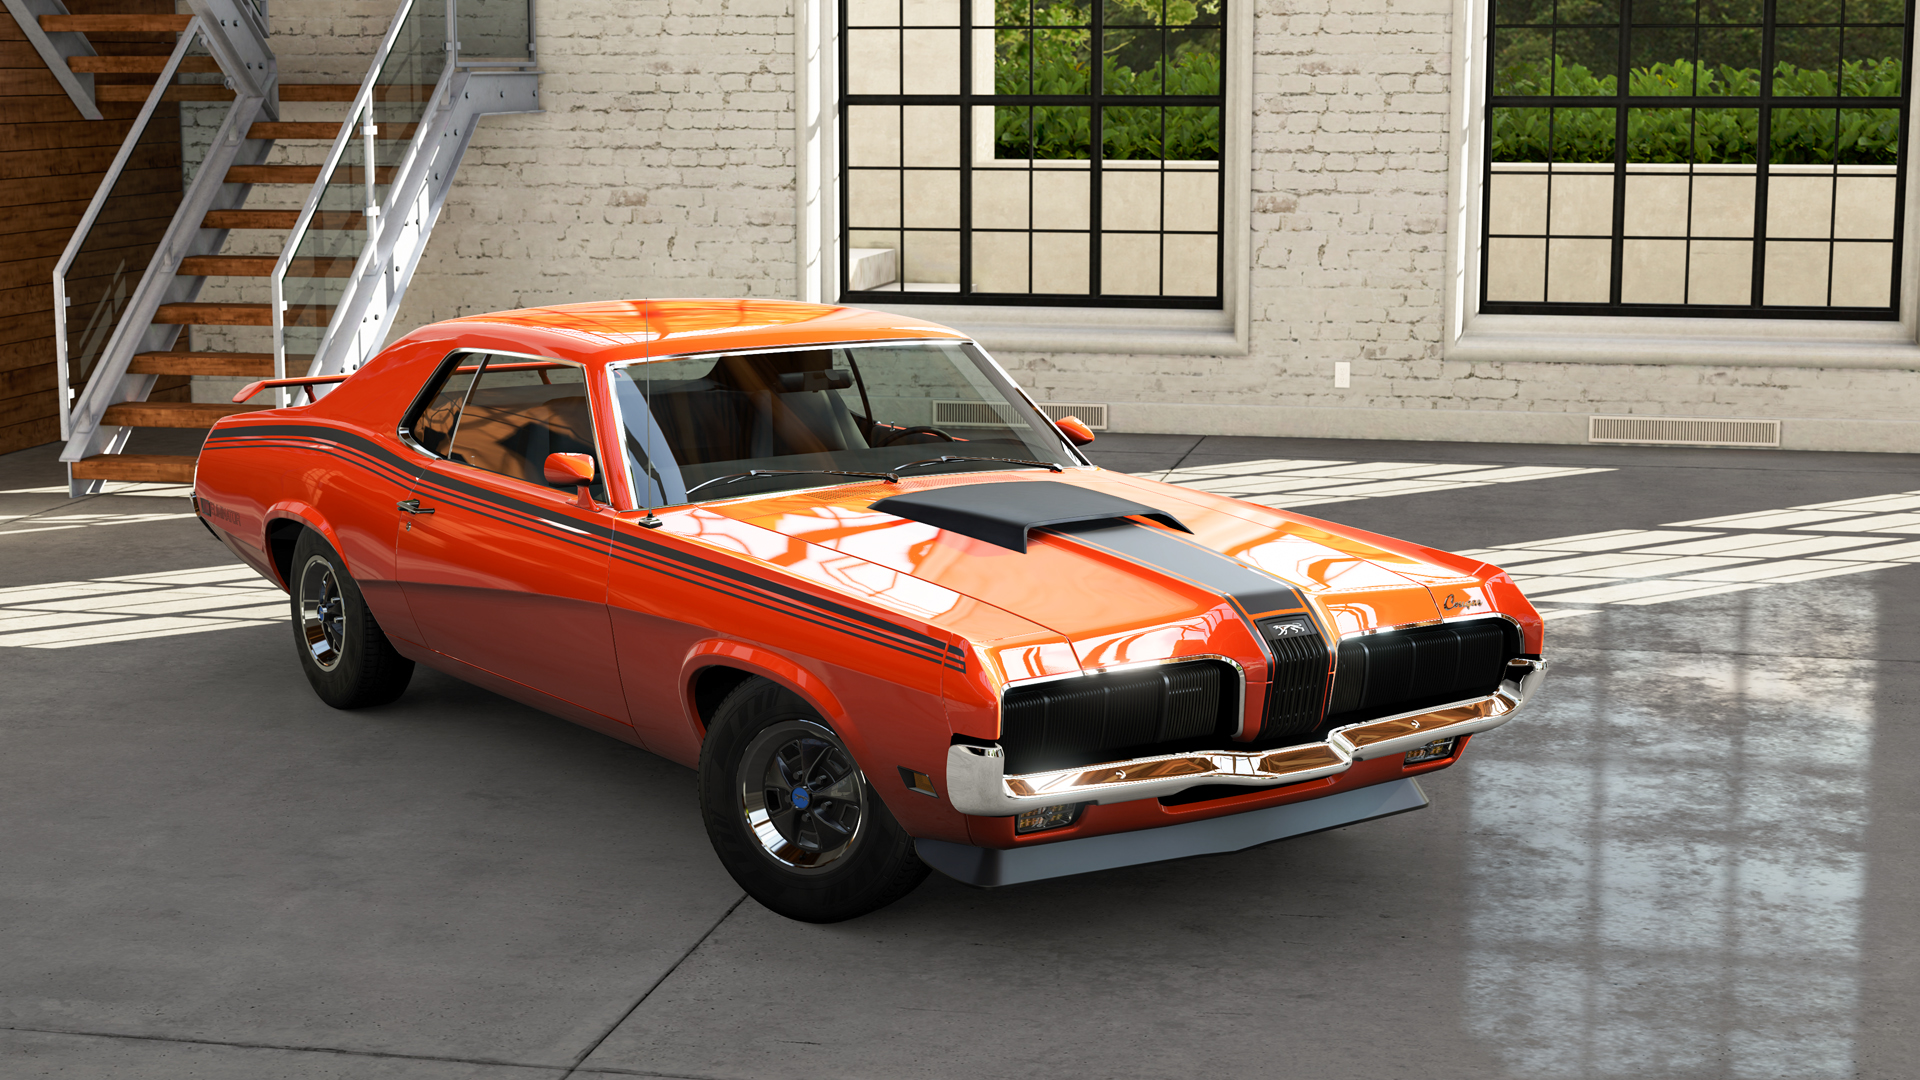 Forza Motorsport 5 - Cars